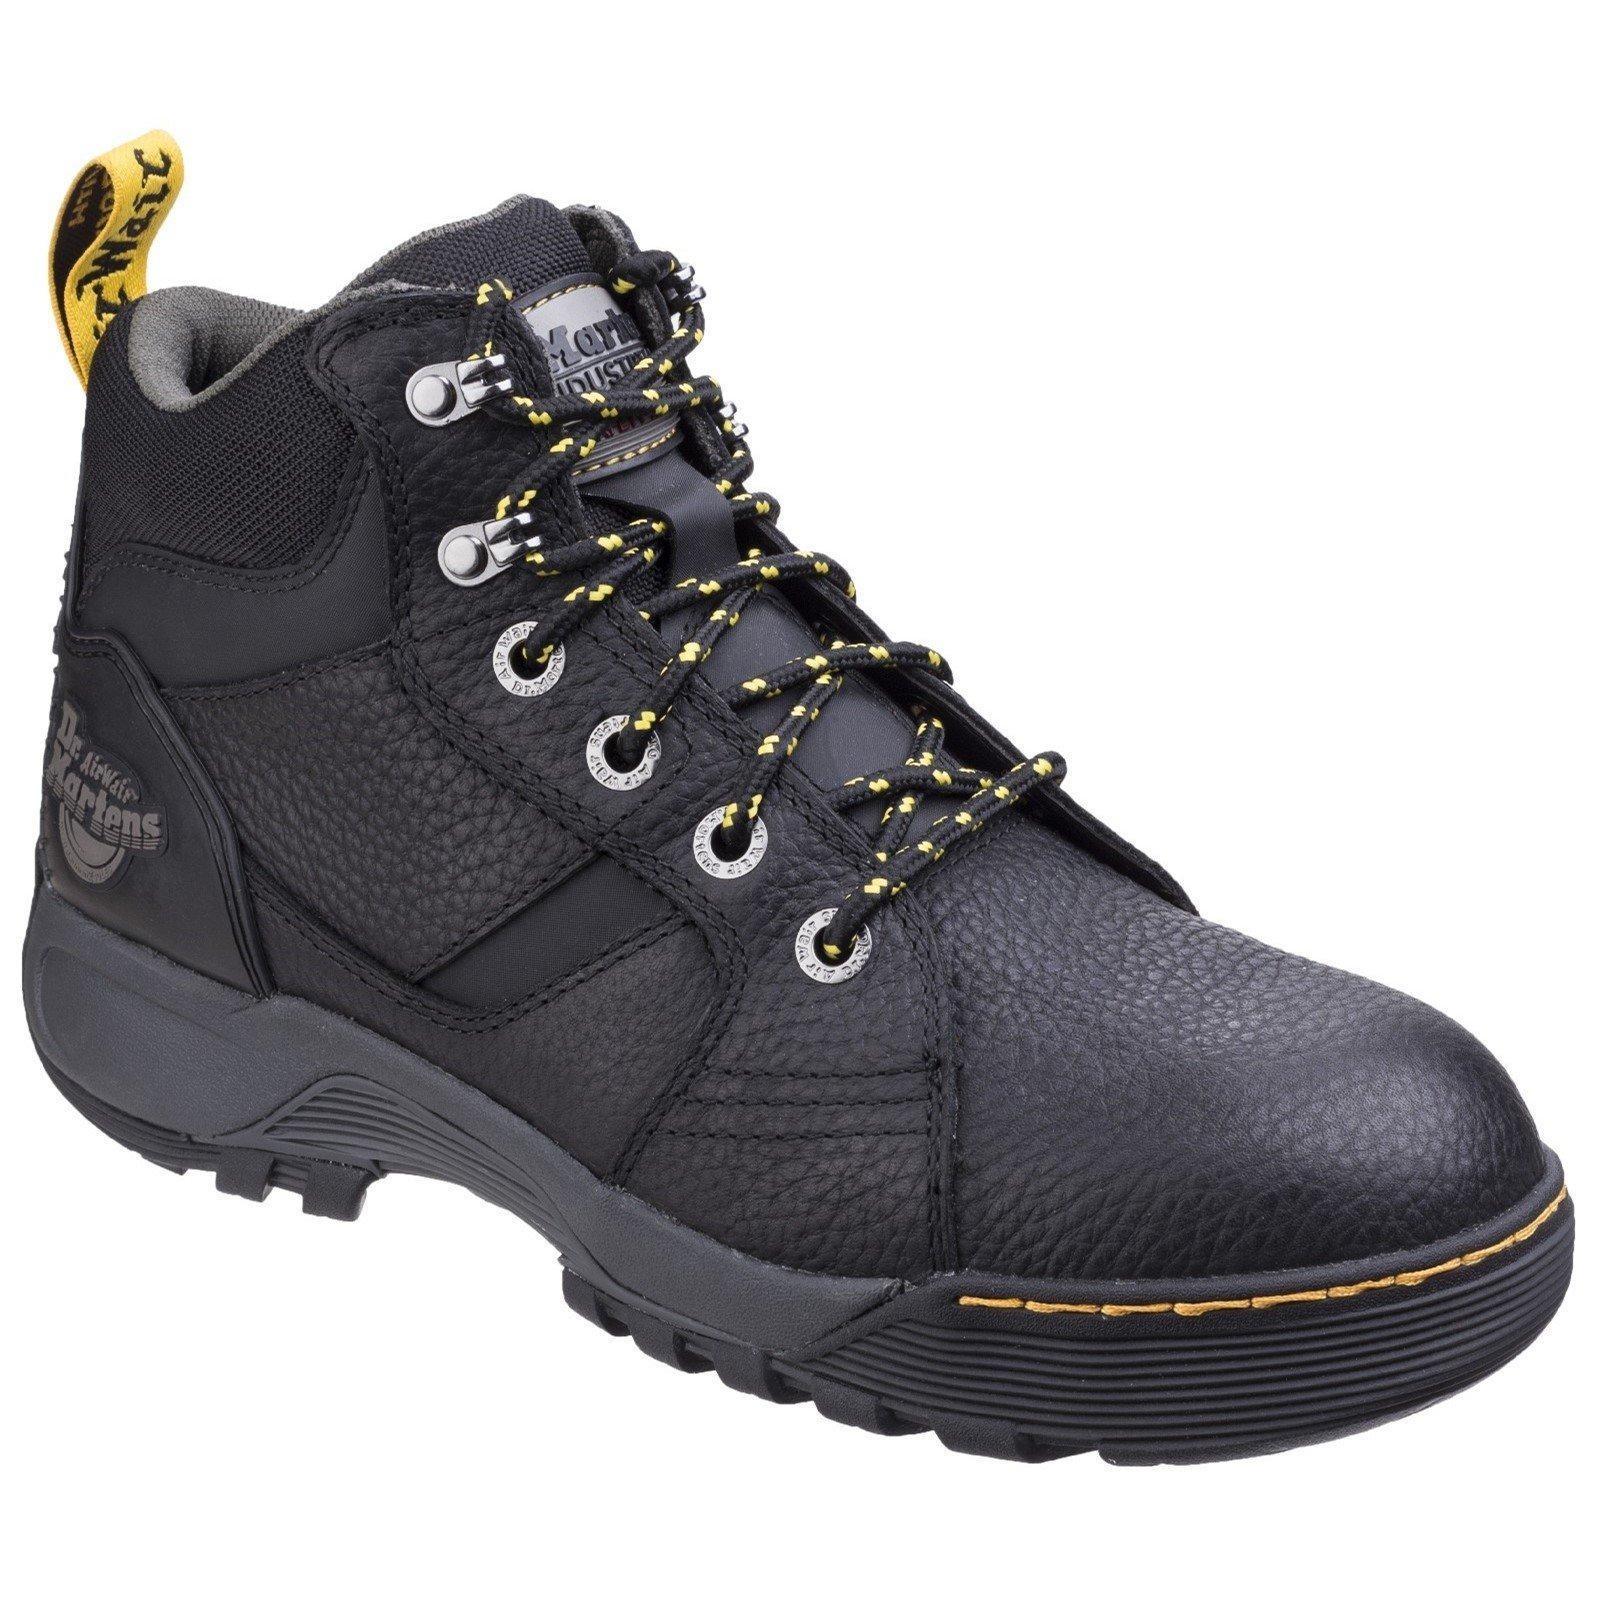 Dr Martens Men's Grapple Safety Boot Various Colours 26023 - Black 7